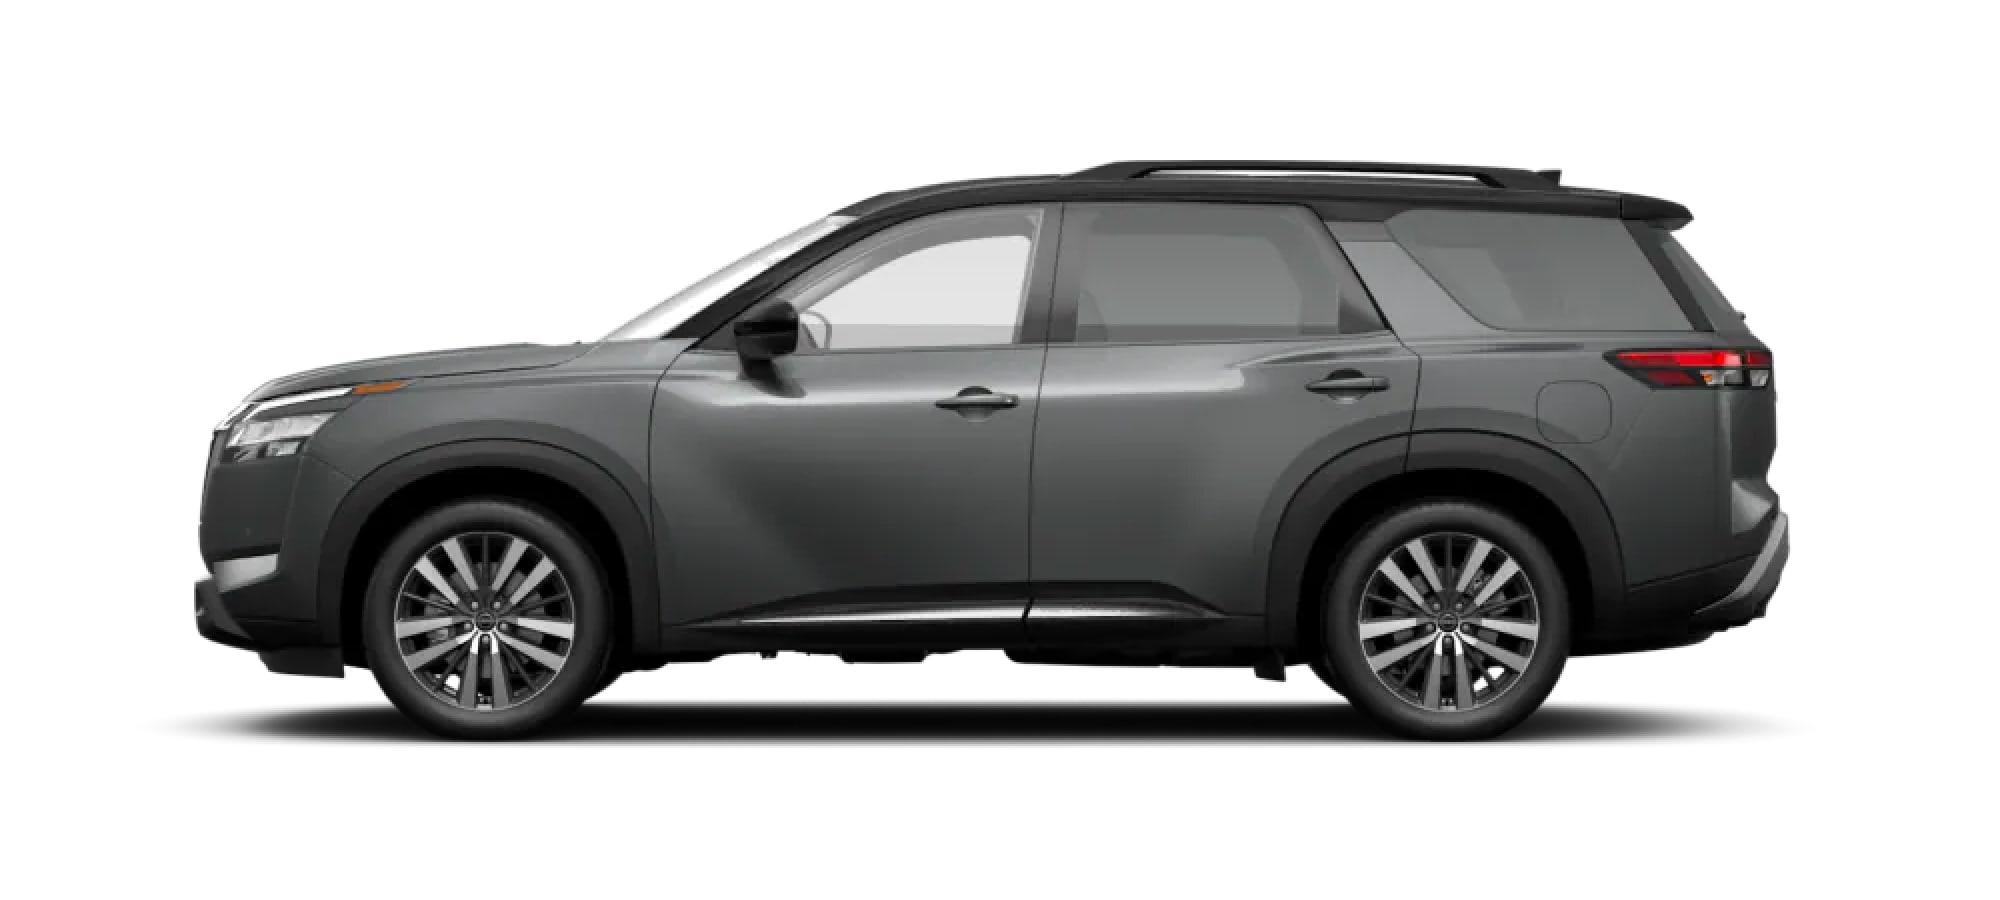 2022 Nissan Pathfinder in Two-Tone Gun Metallic / Super Black